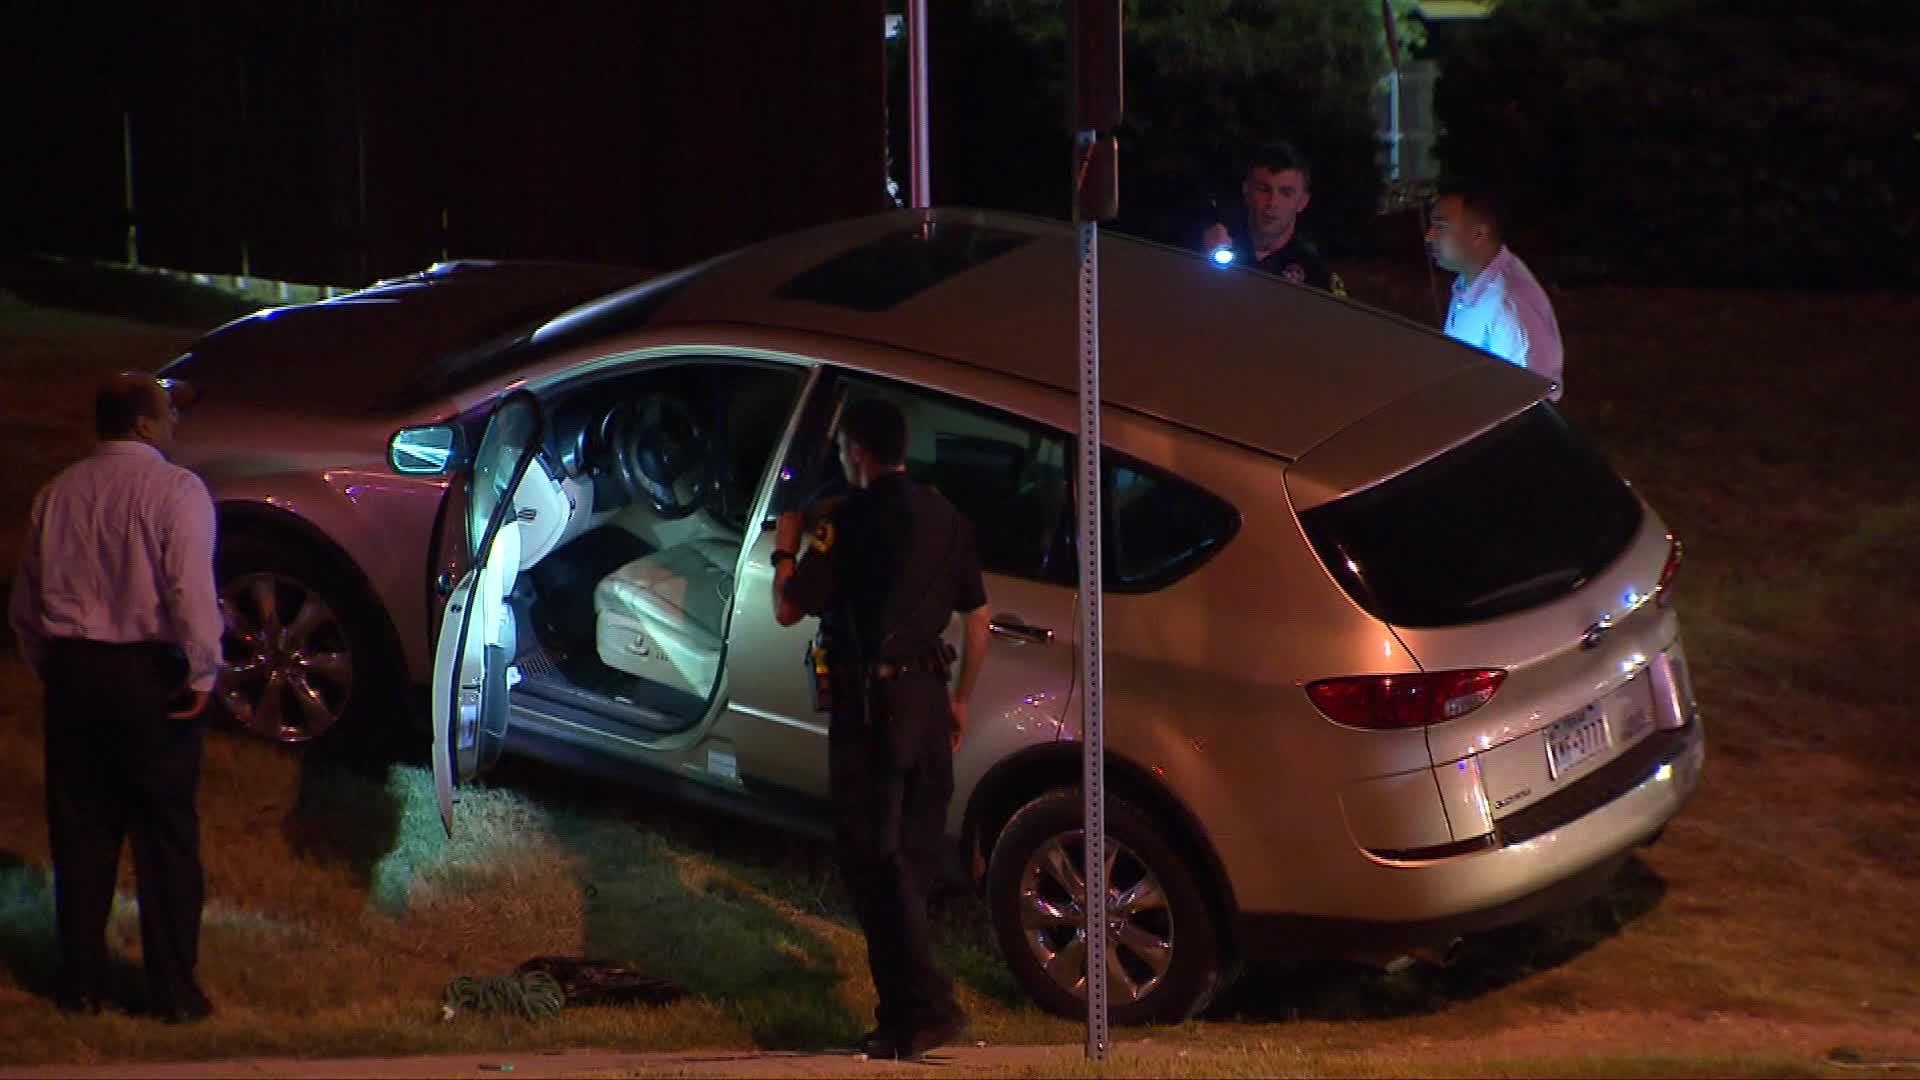 Police: Shanann Watts' body has been found - CNN Video